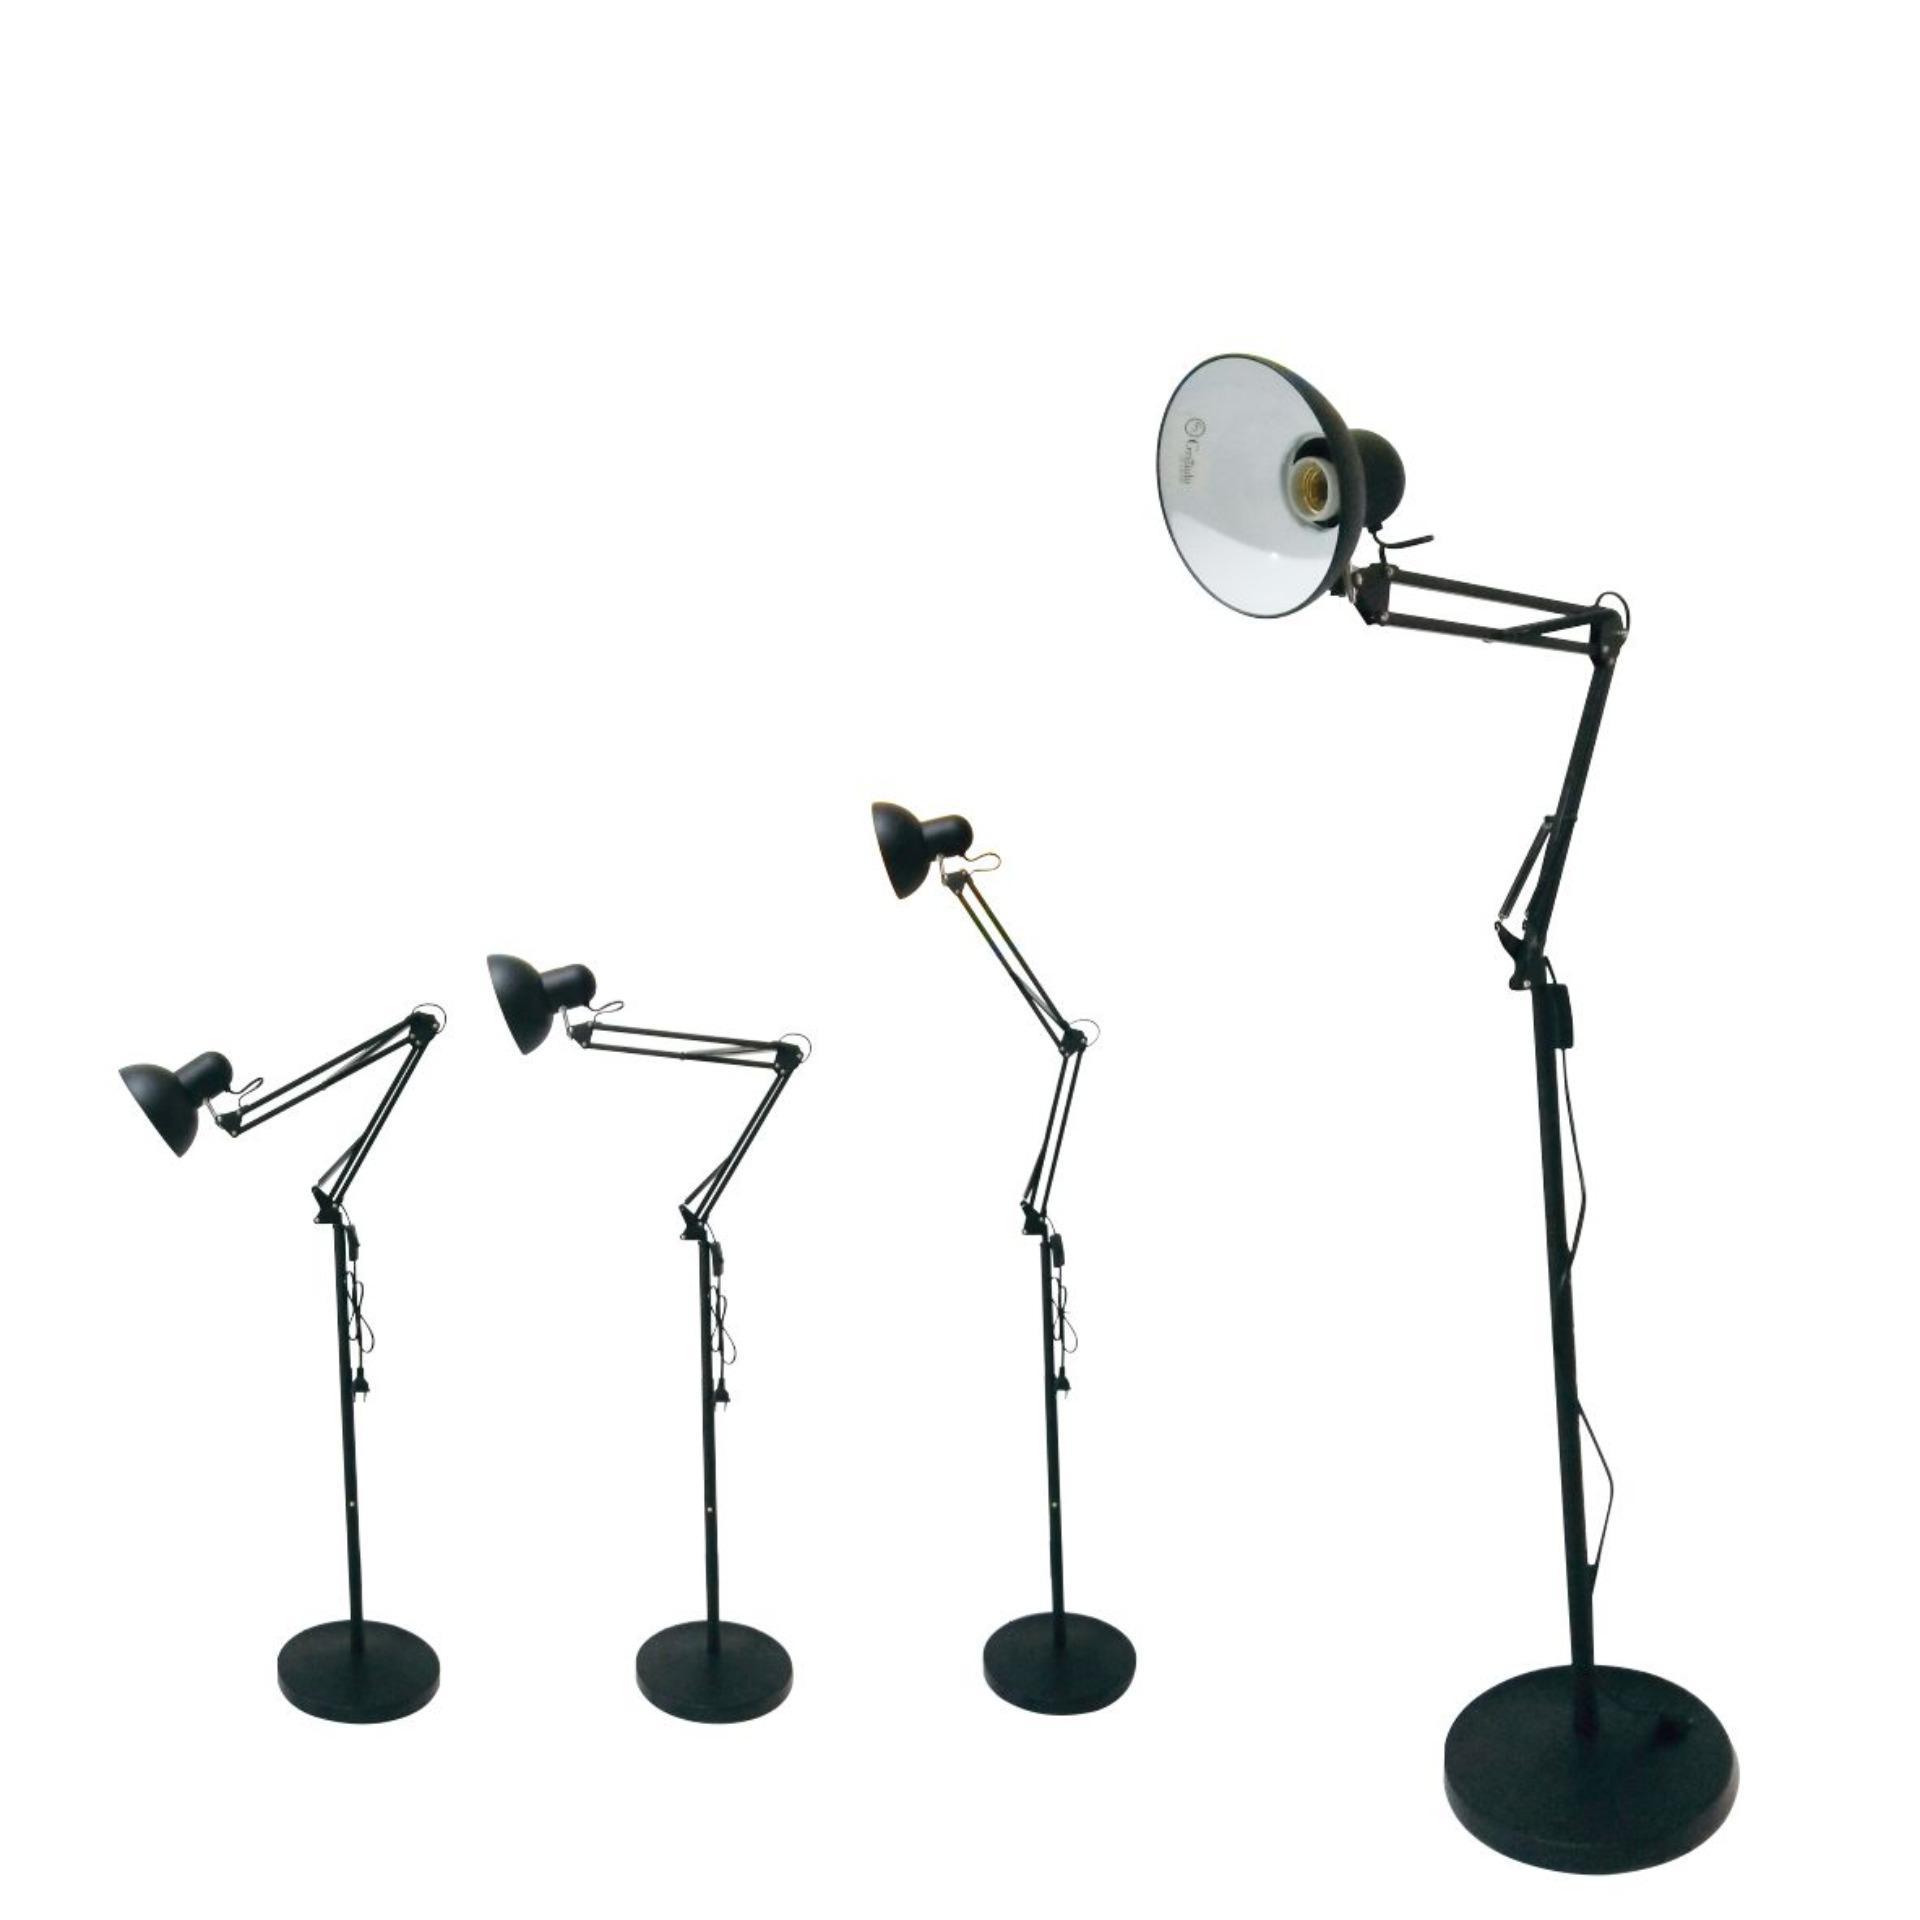 WEITECH LAMPU BERDIRI/LAMPU LANTAI/ LAMPU BACA 930